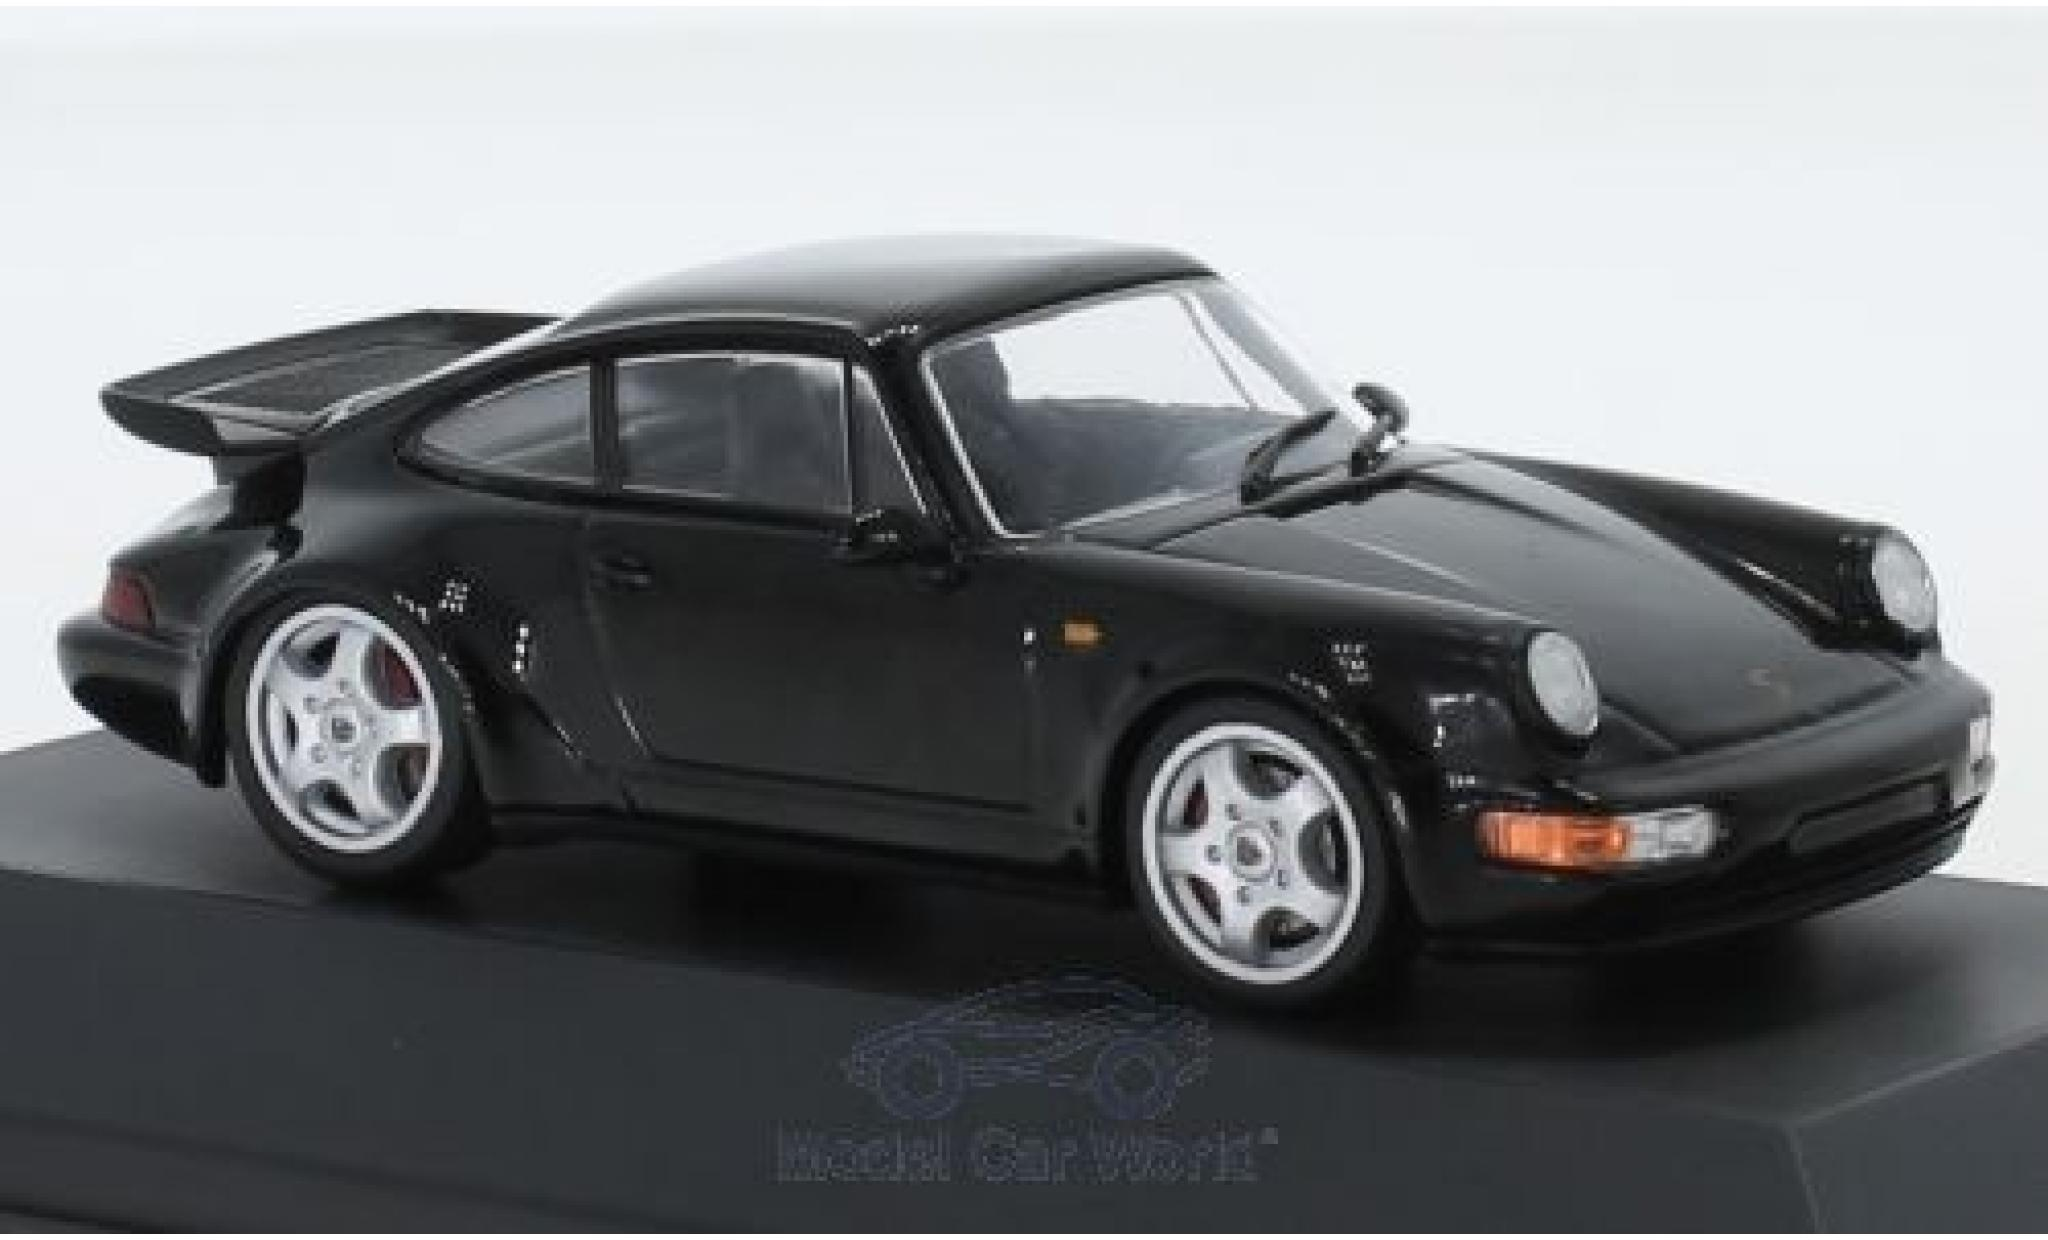 Porsche 964 Turbo 1/43 SpecialC 111 911  black 1990 911 Collection